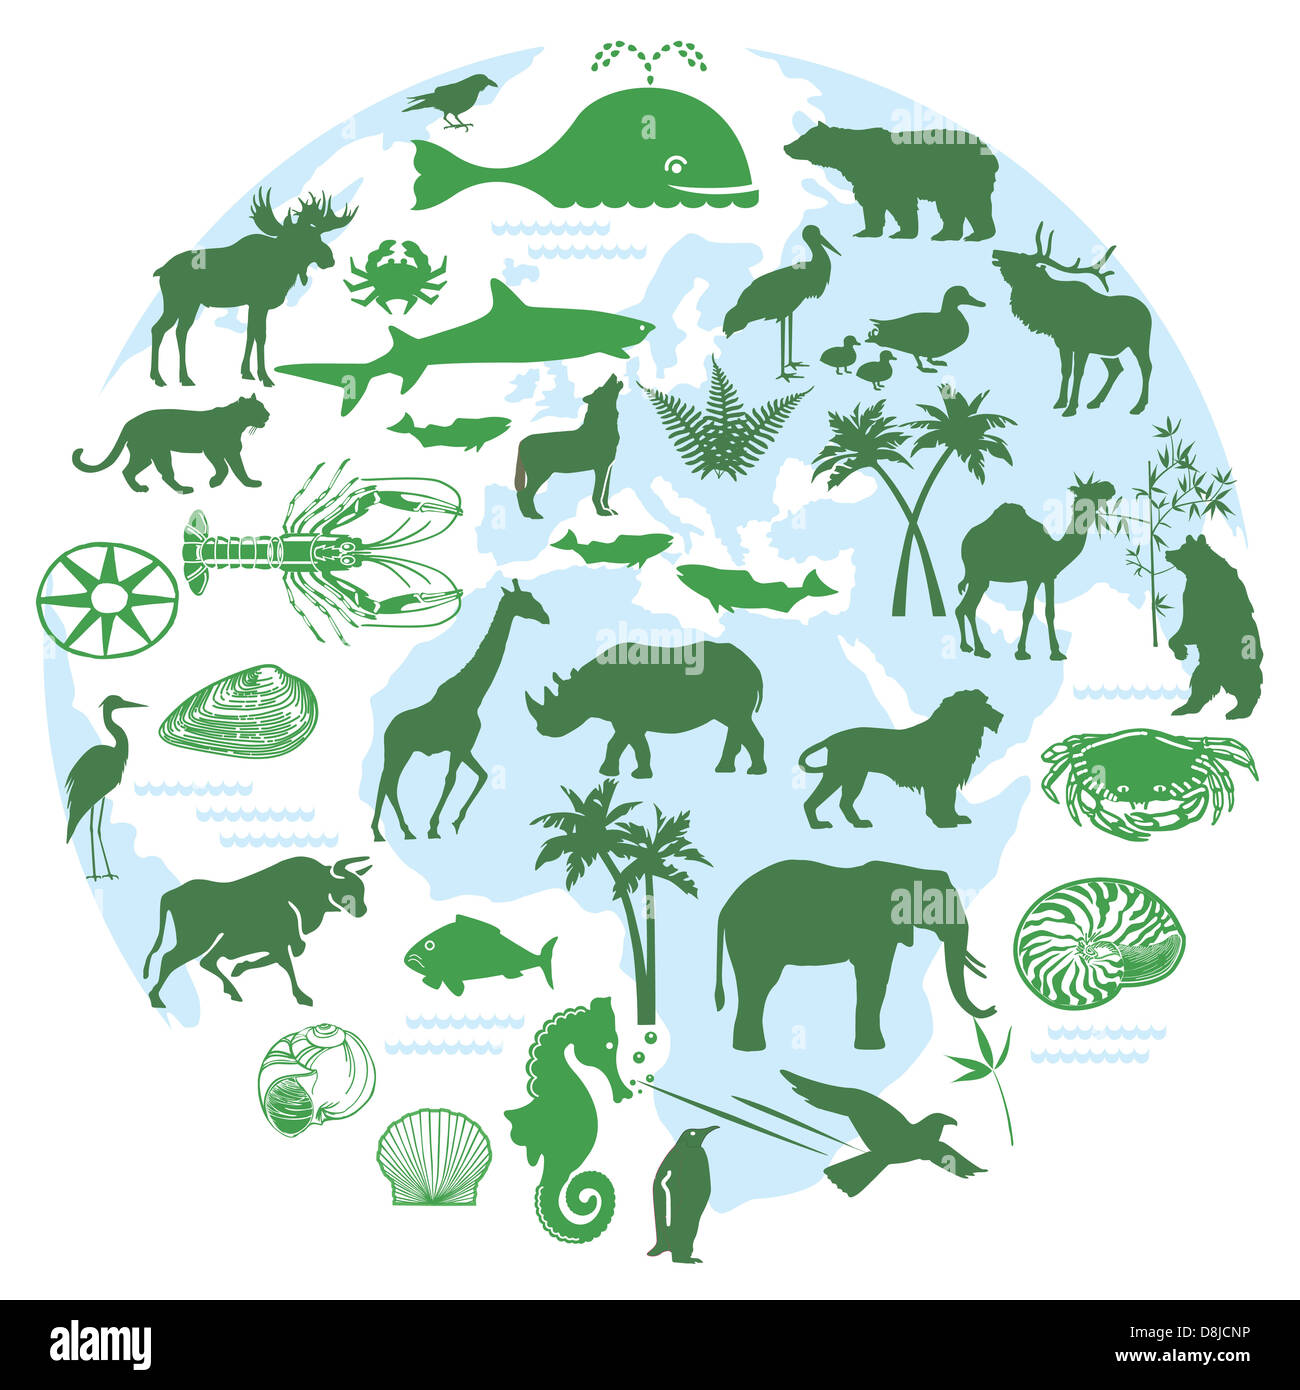 animal symbols - Stock Image